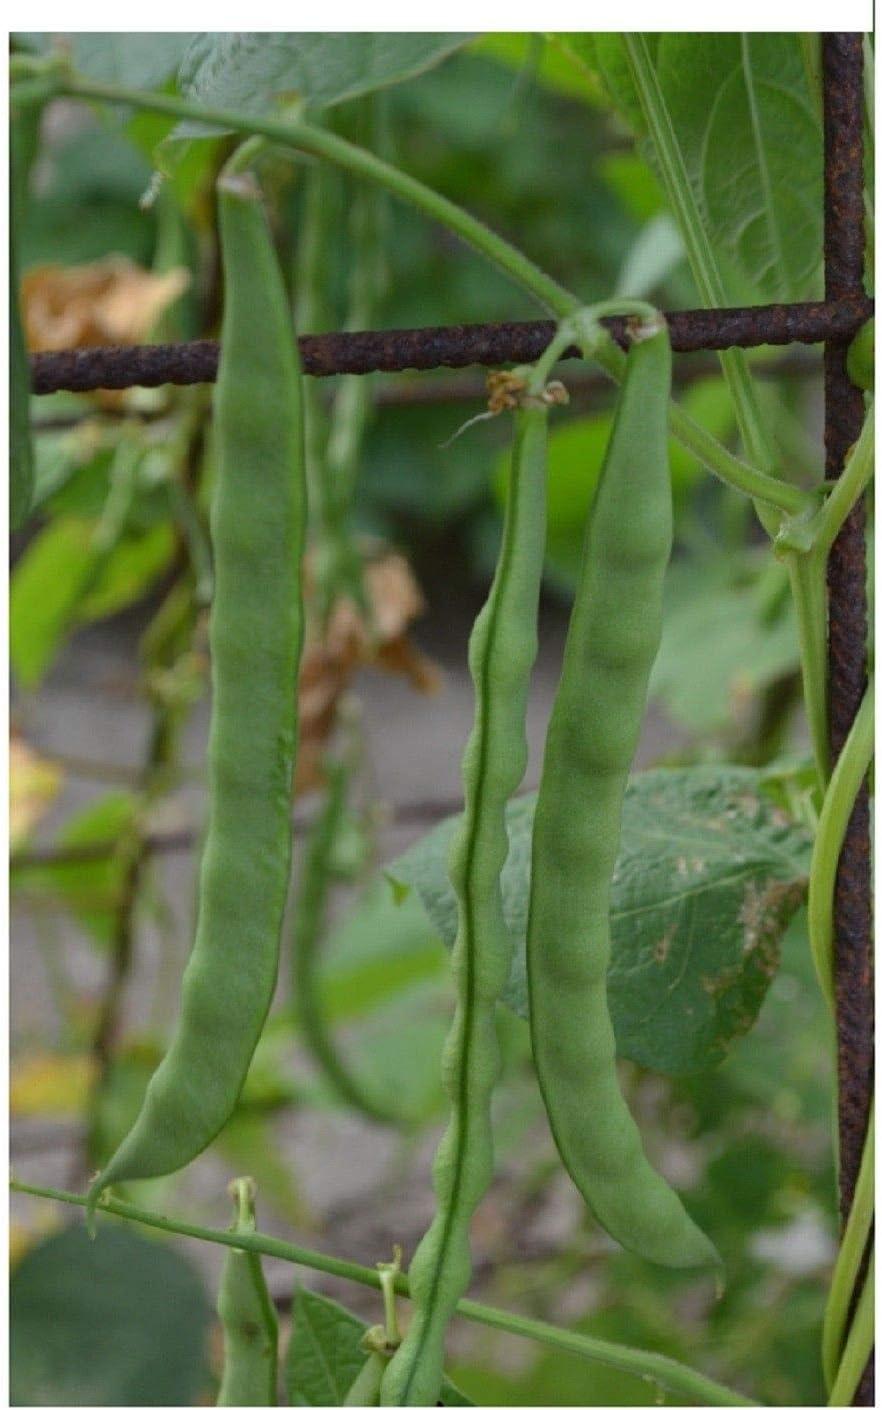 Portal Cool Bush Verde Frijol Semillas Huerto Grano de Princesa ...